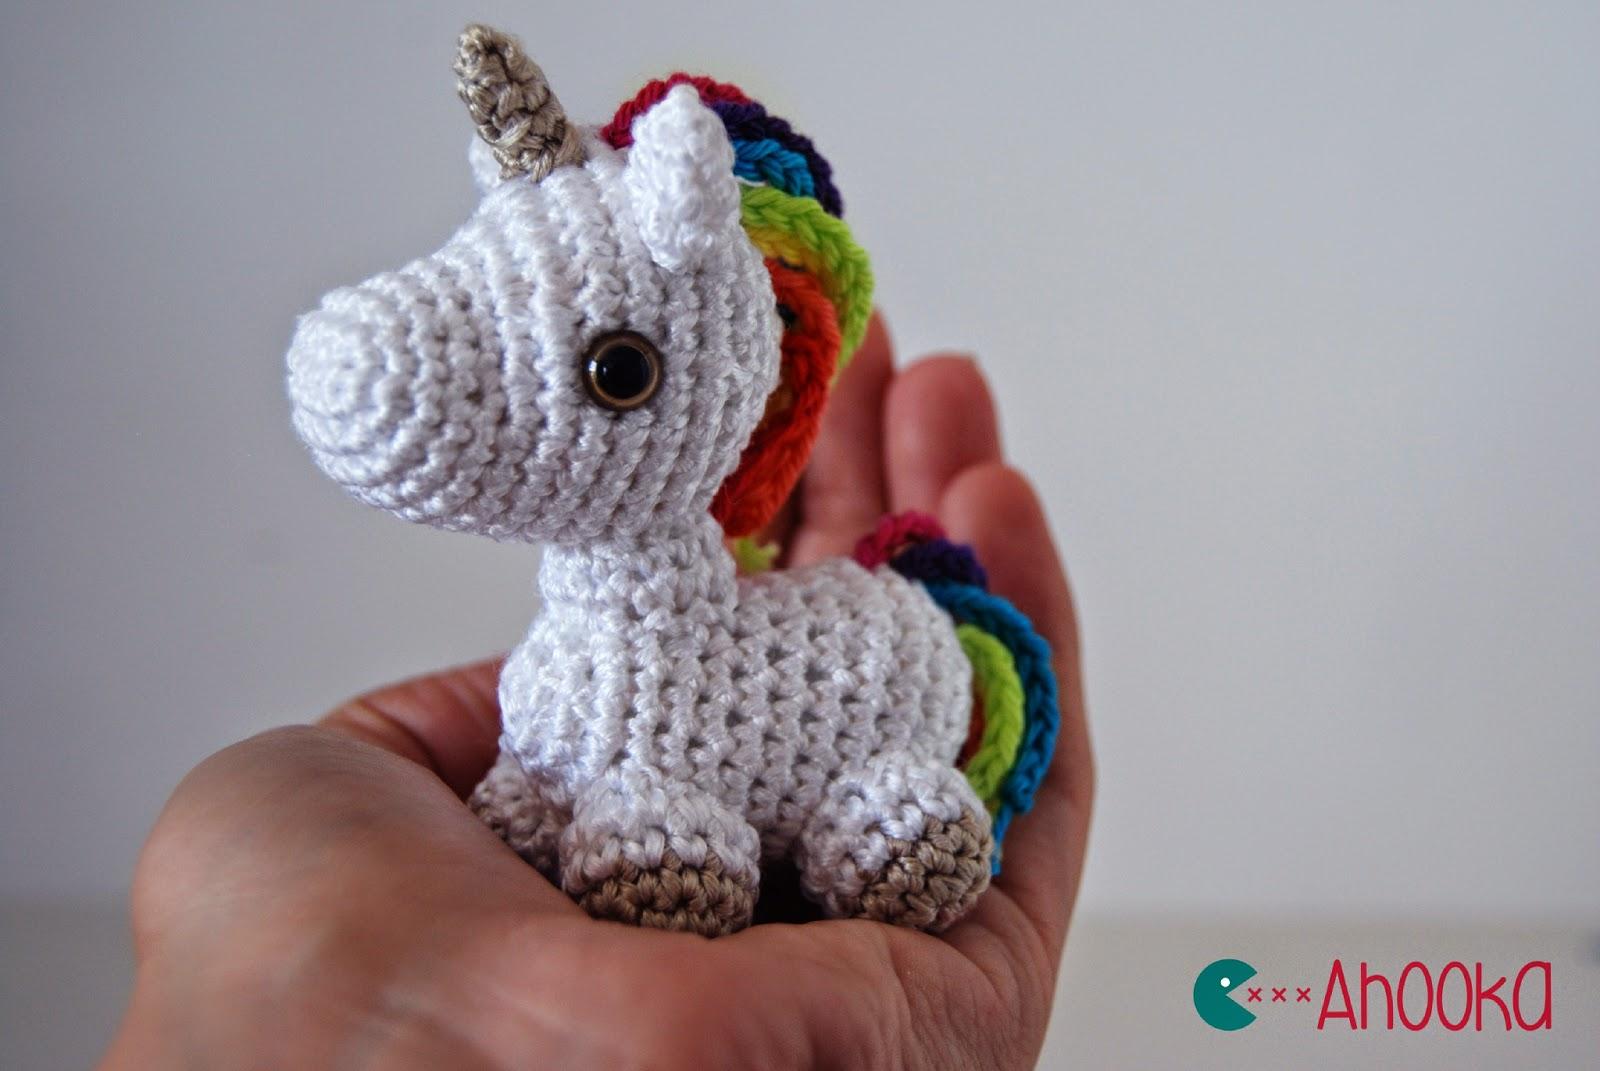 dada neon crochet tiny rainbow unicorn amigurumi by ahooka as a giant. Black Bedroom Furniture Sets. Home Design Ideas